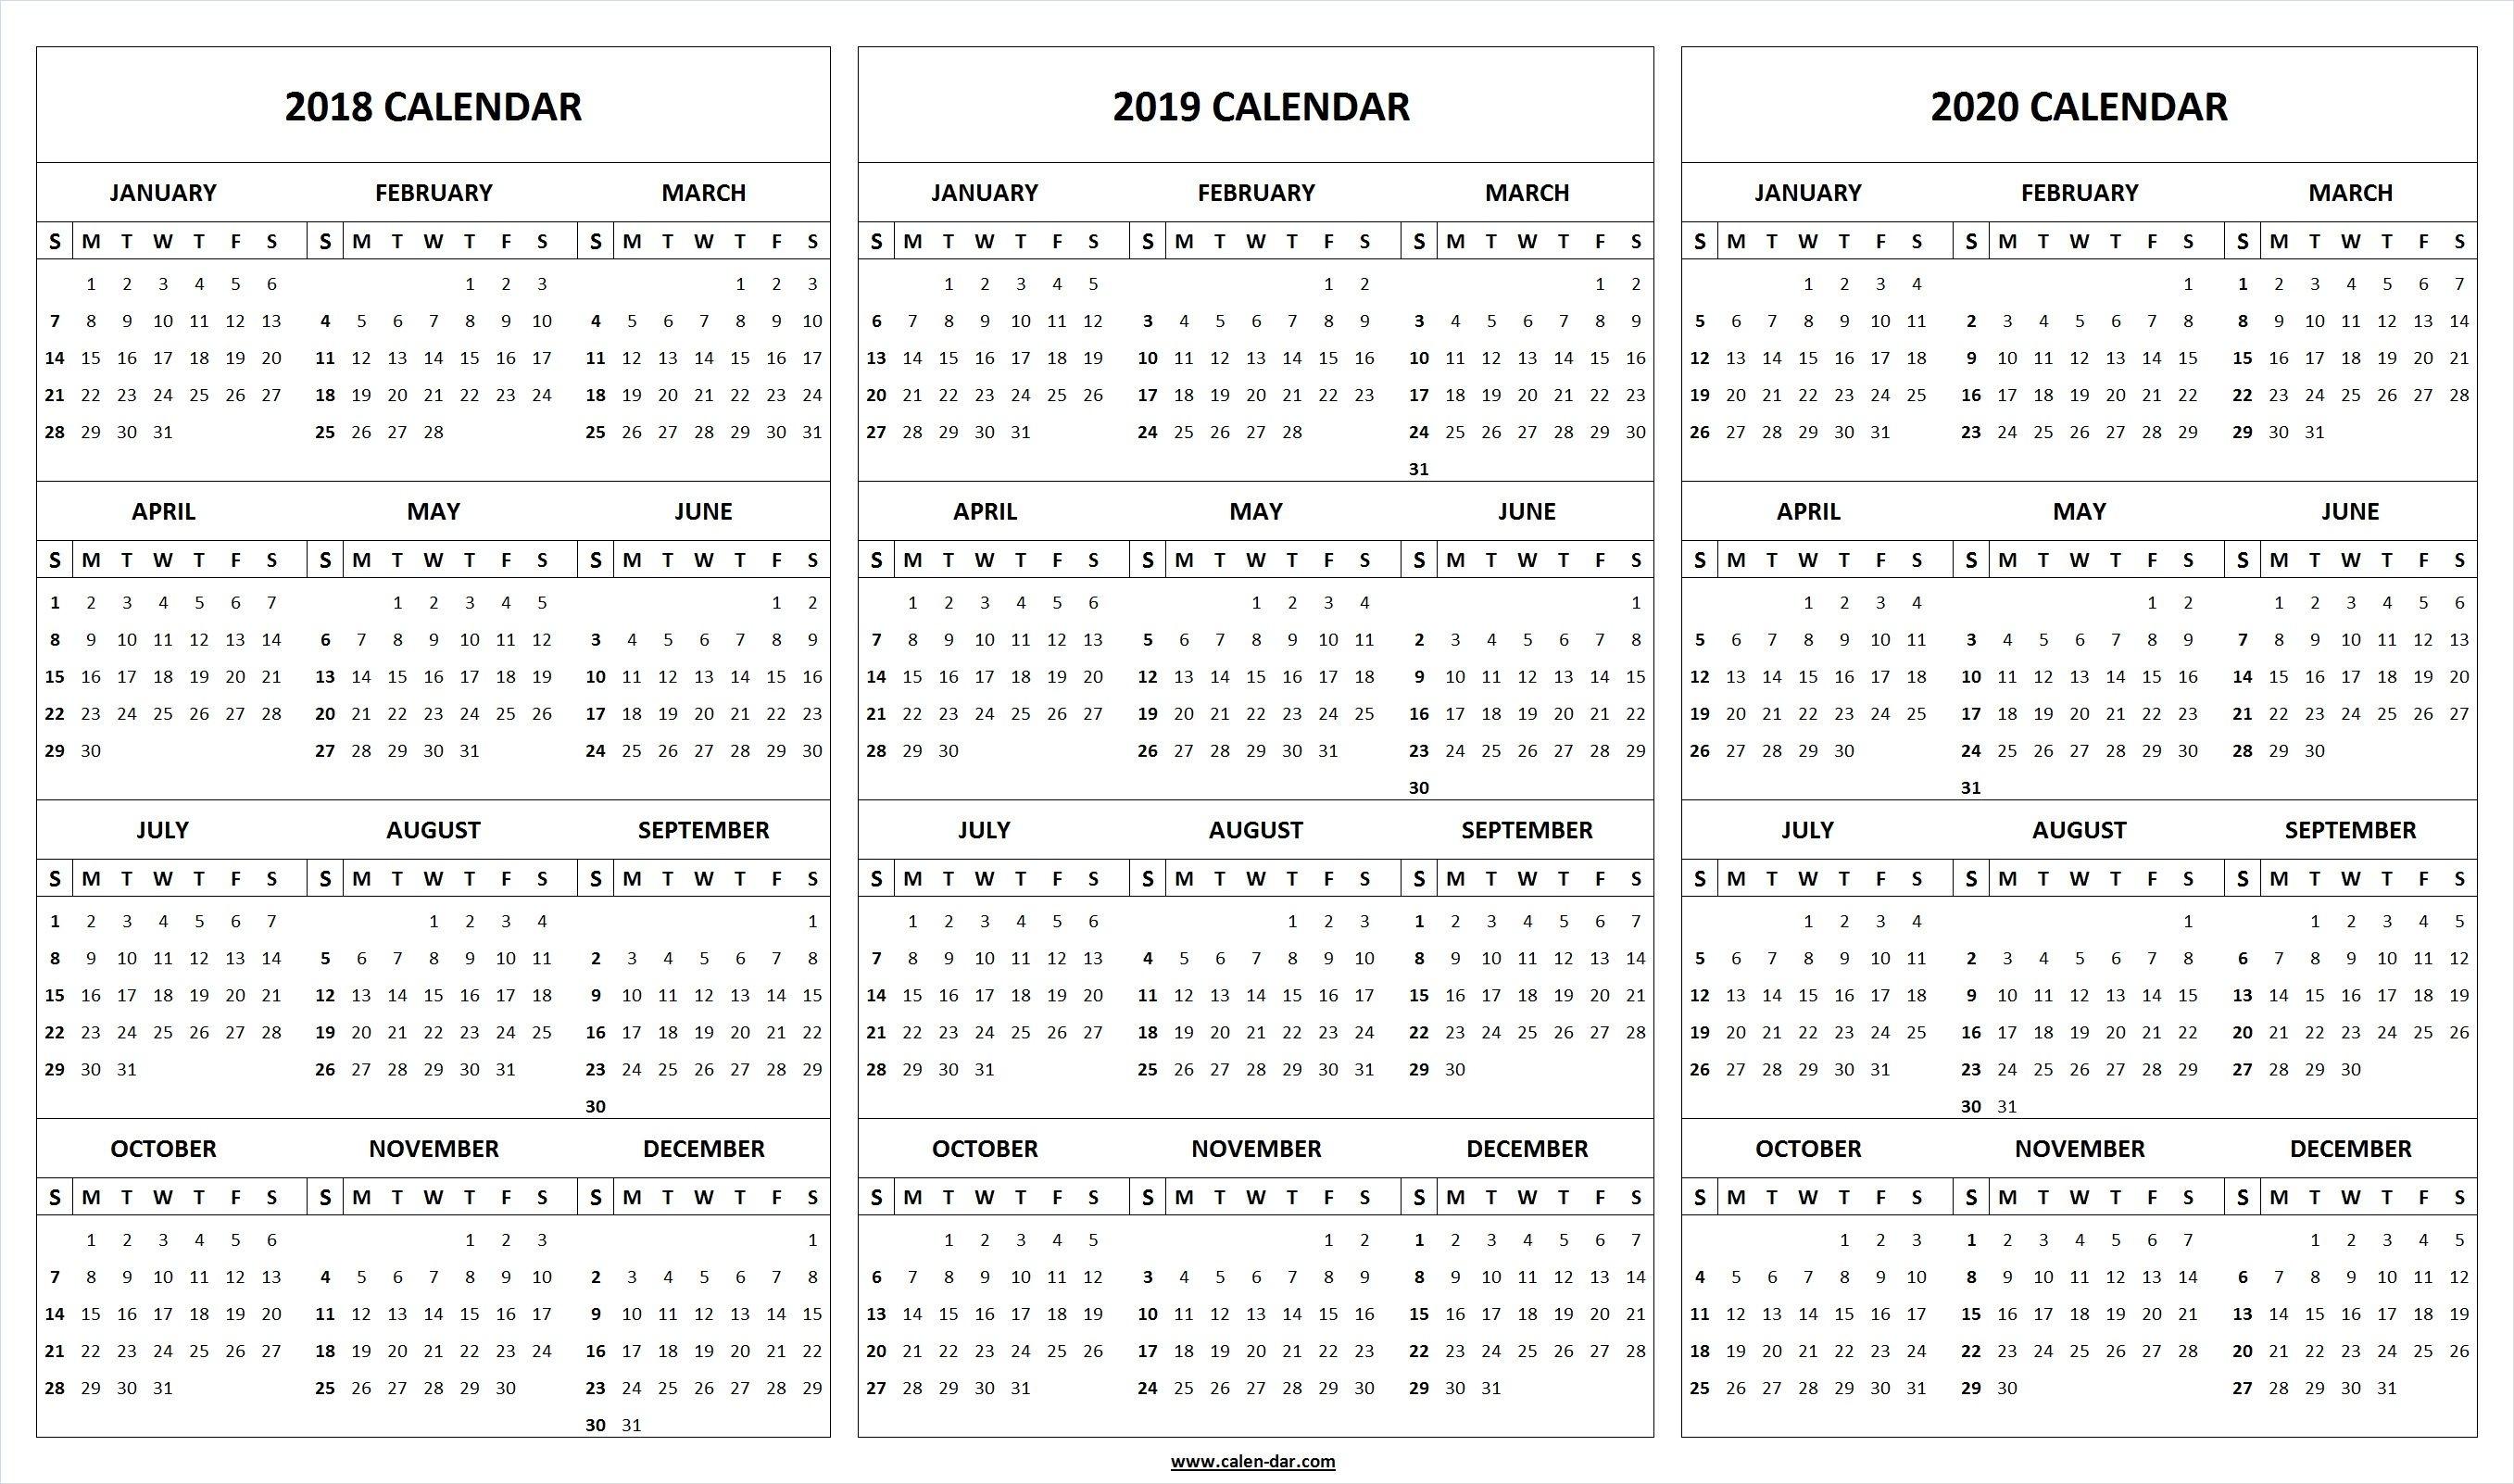 Print Blank 2018 2019 2020 Calendar Template   Organize!   Printable inside Half Page Calendar Template 2019/2020